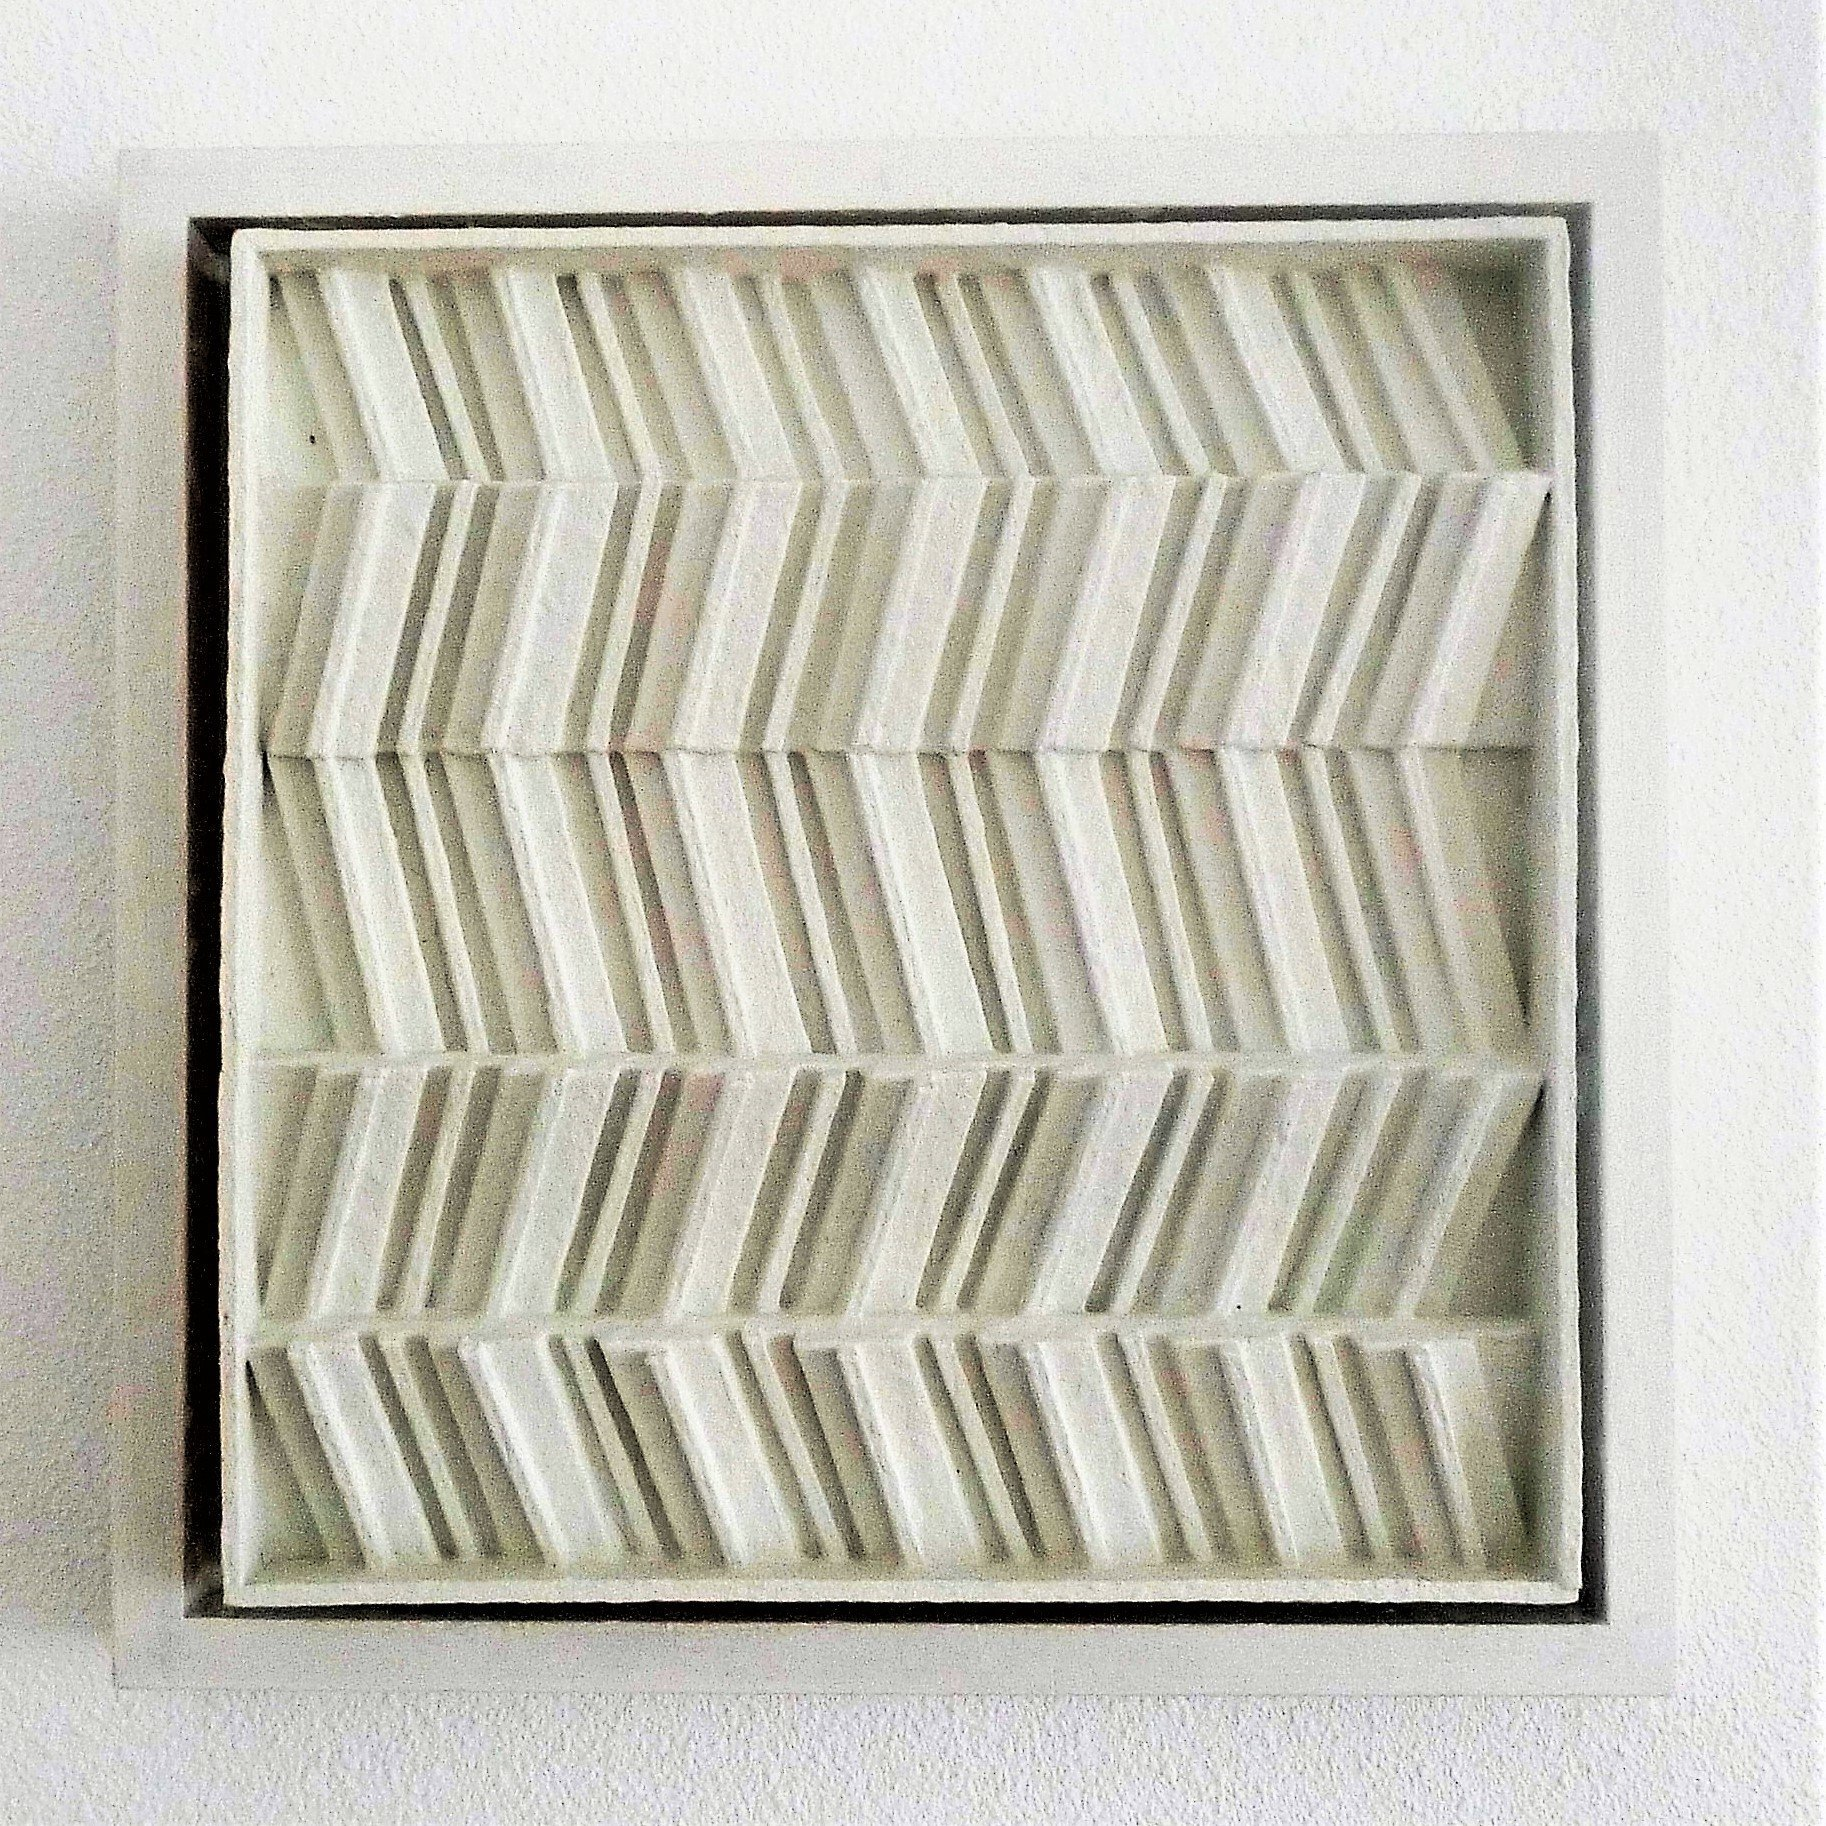 Rob-van-Hemert ZigZag Waves (30x30x5,.jpg